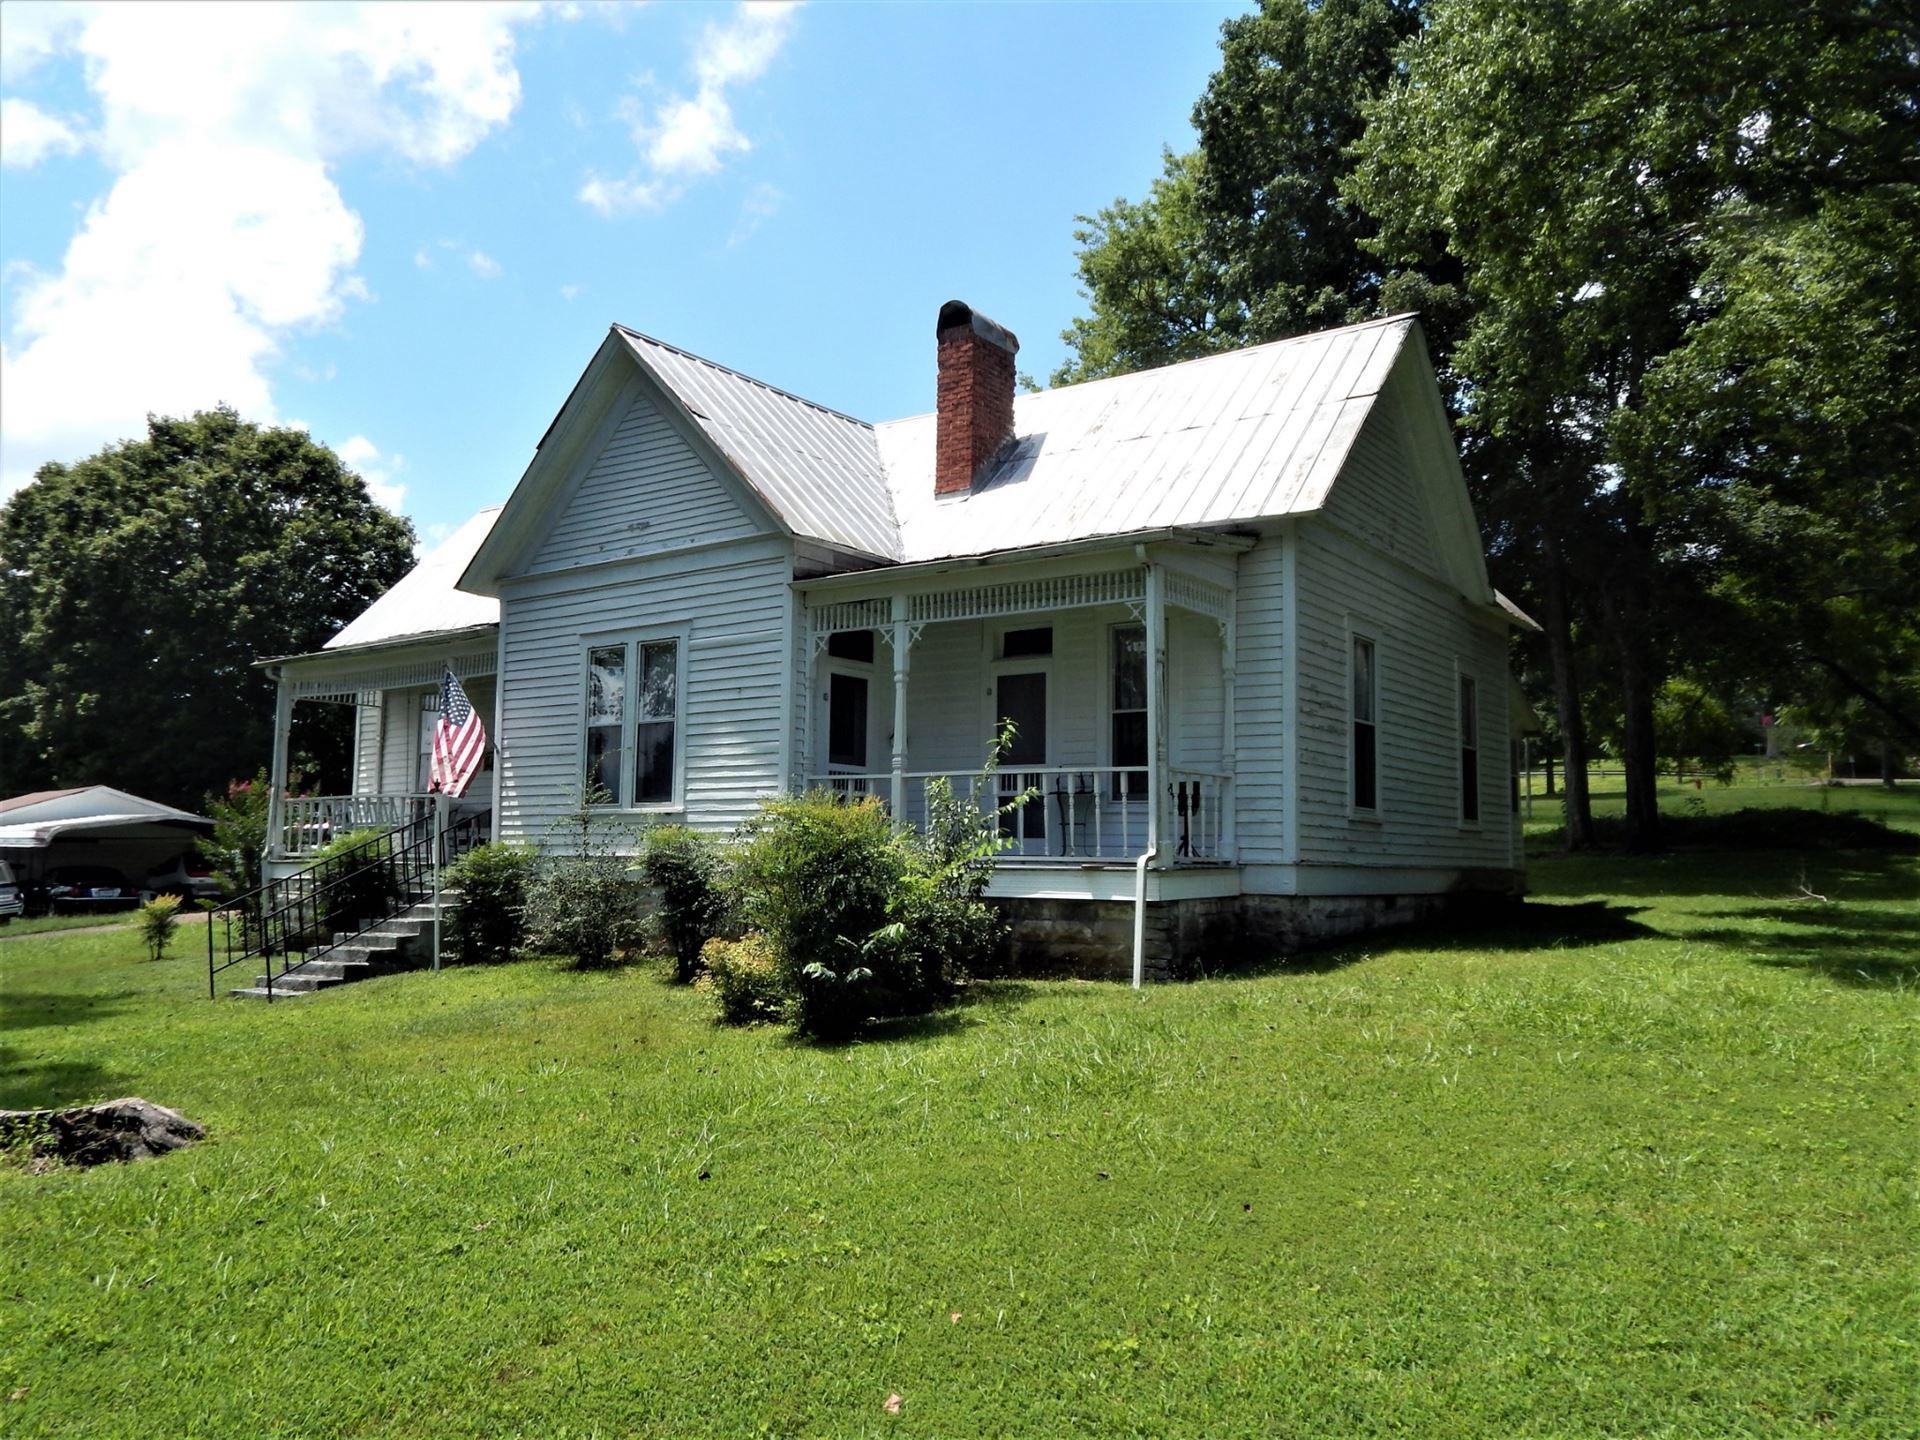 Photo of 320 S Main St, Waynesboro, TN 38485 (MLS # 2178644)